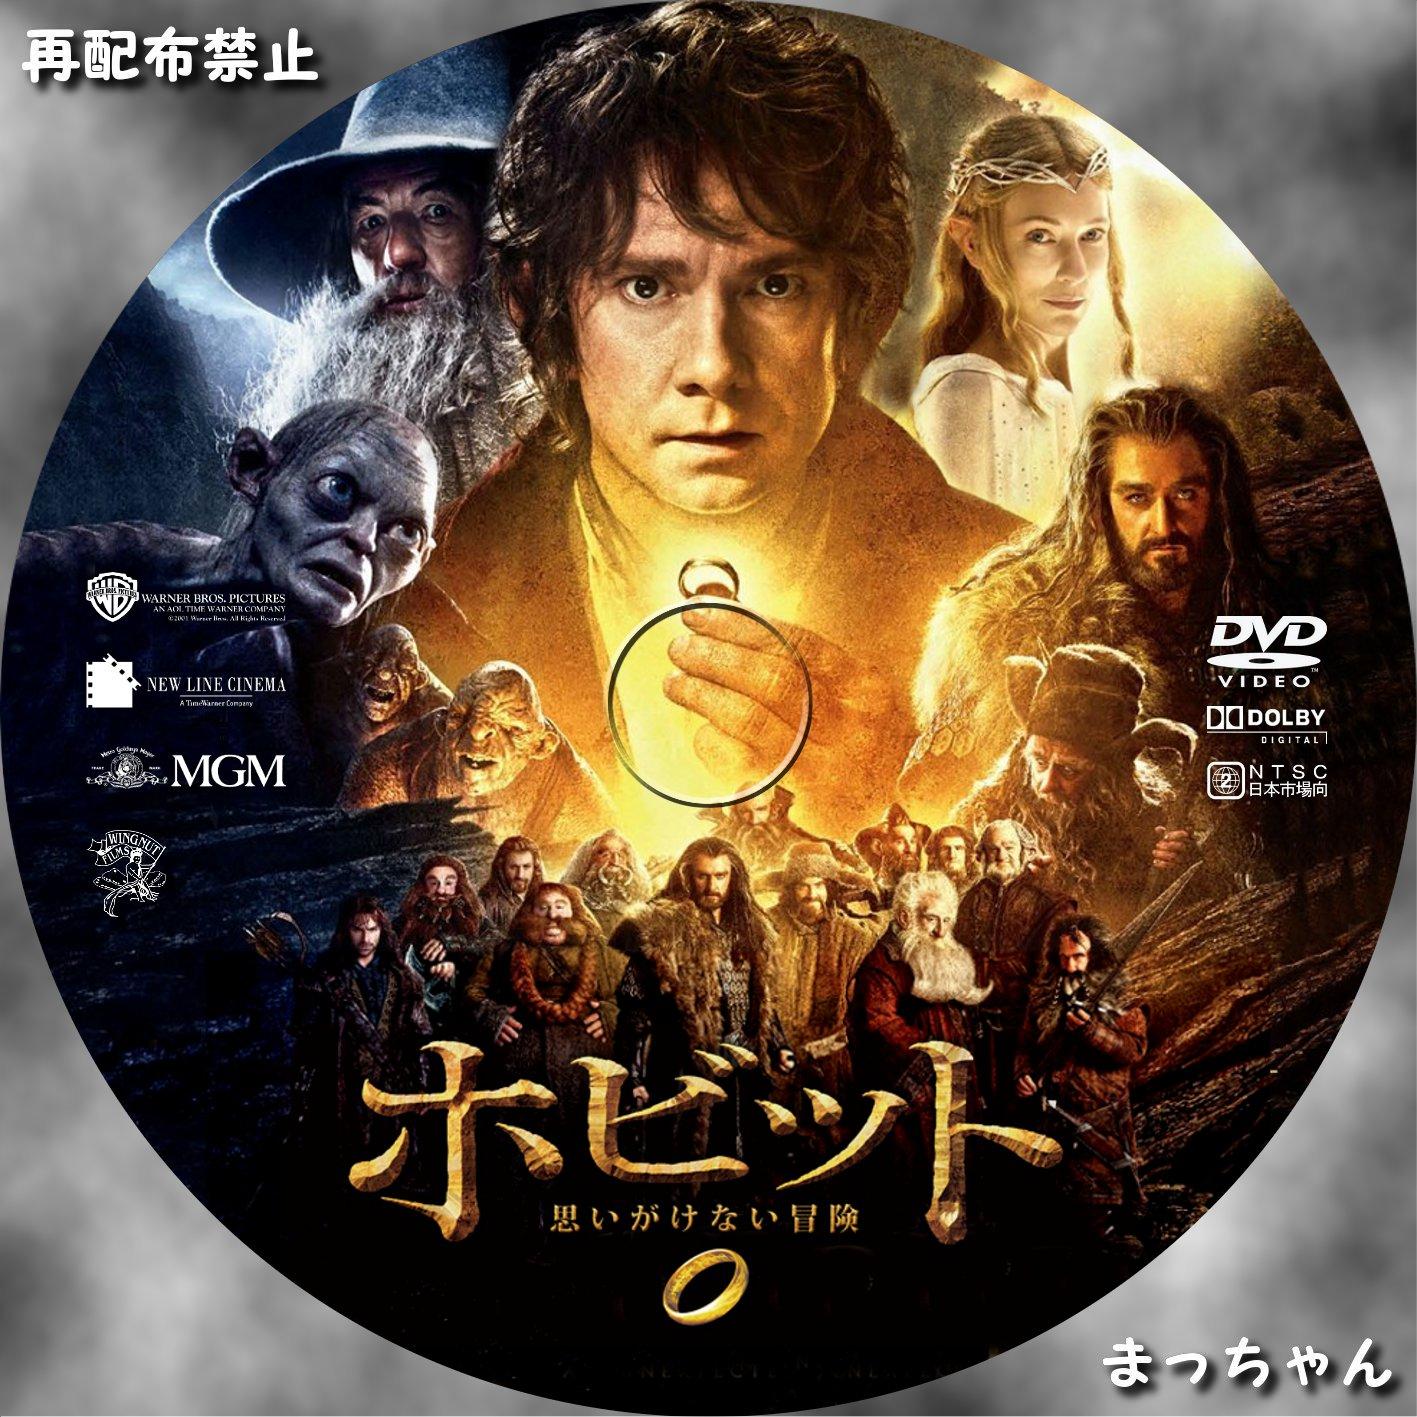 THE HOBBIT AN UNEXPECTED JOURNEY 01 jpgThe Hobbit An Unexpected Journey Dvd